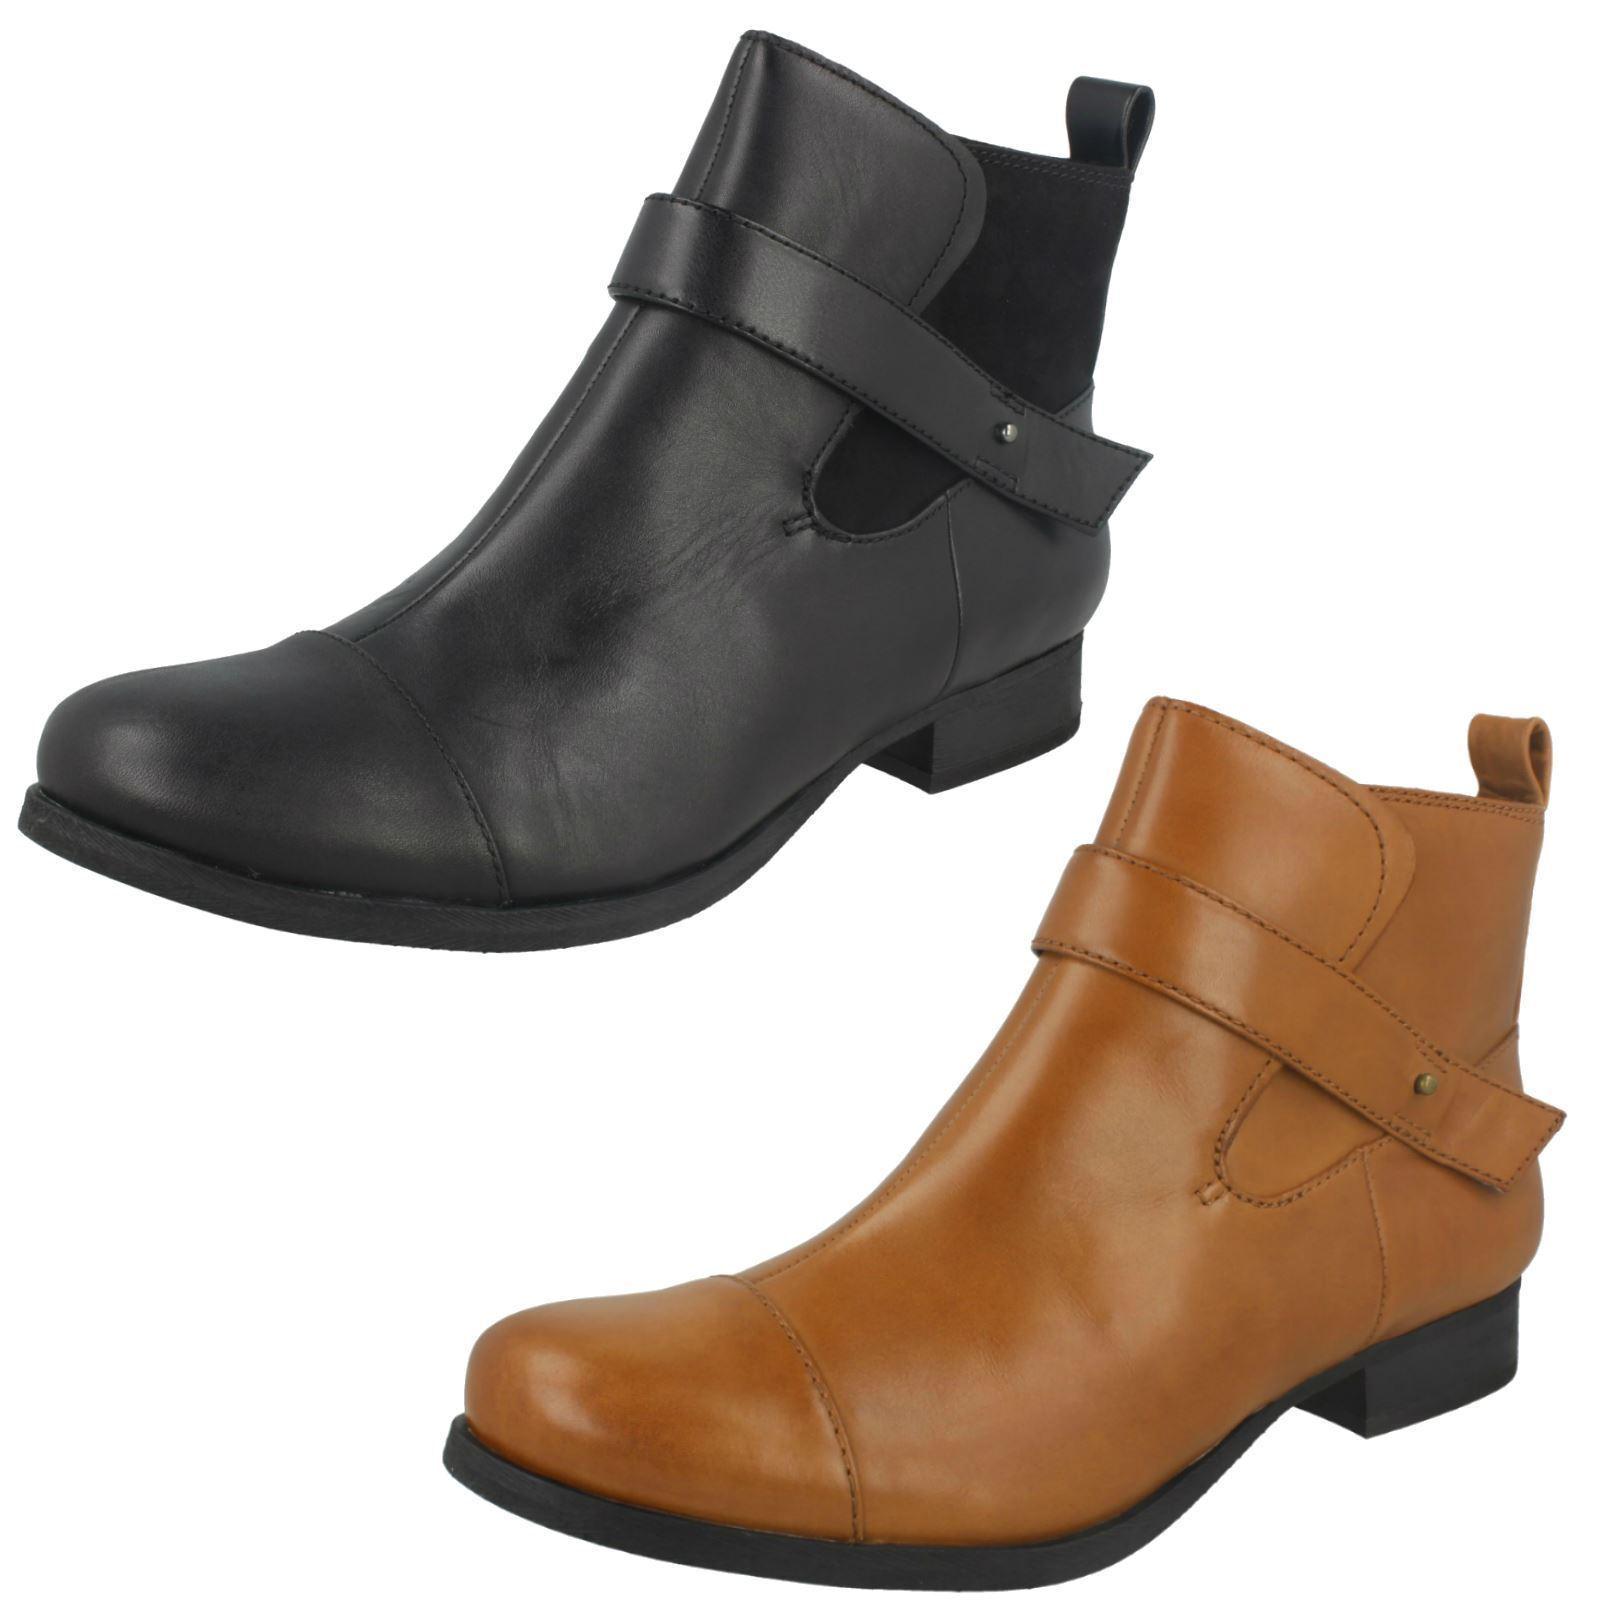 Ladies Clarks Boots - Ladbroke Magic